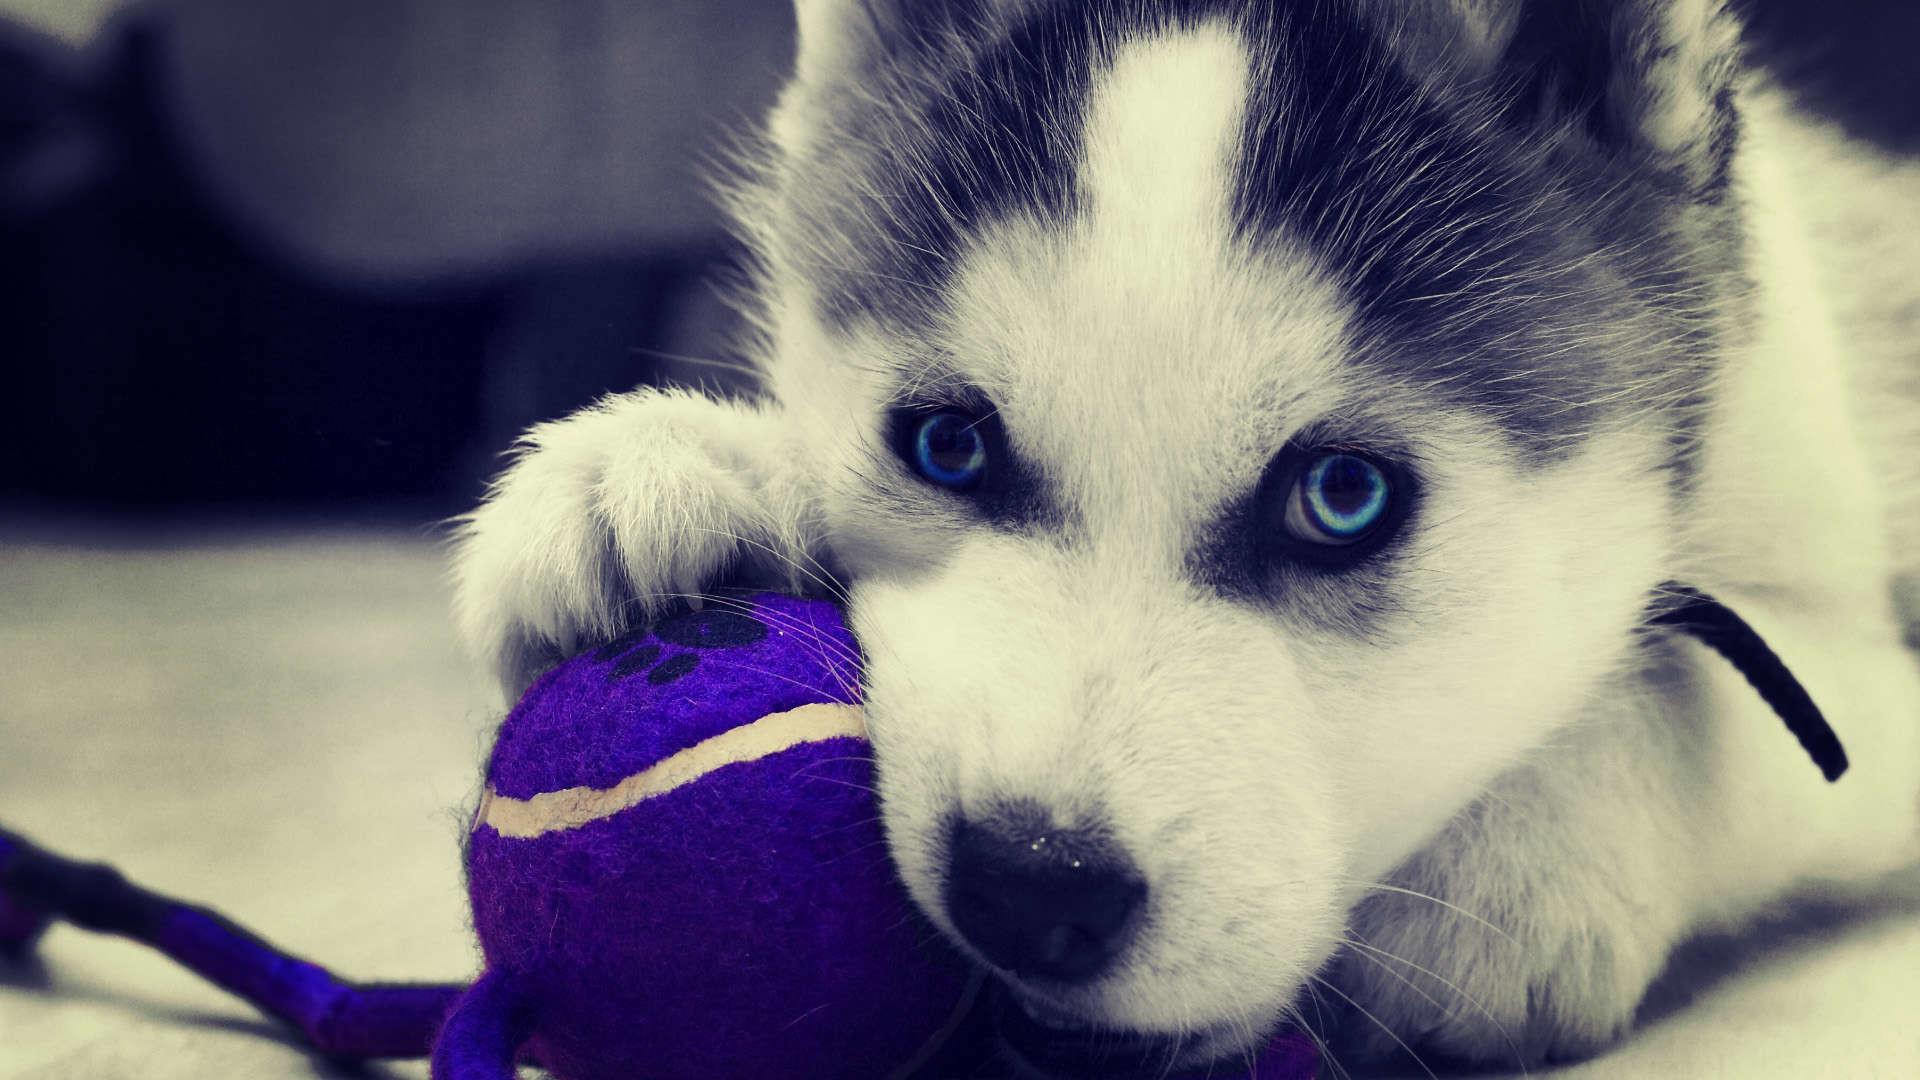 Wallpaper: Siberian Husky Puppies Wallpaper HD 1080p. Upload at March .